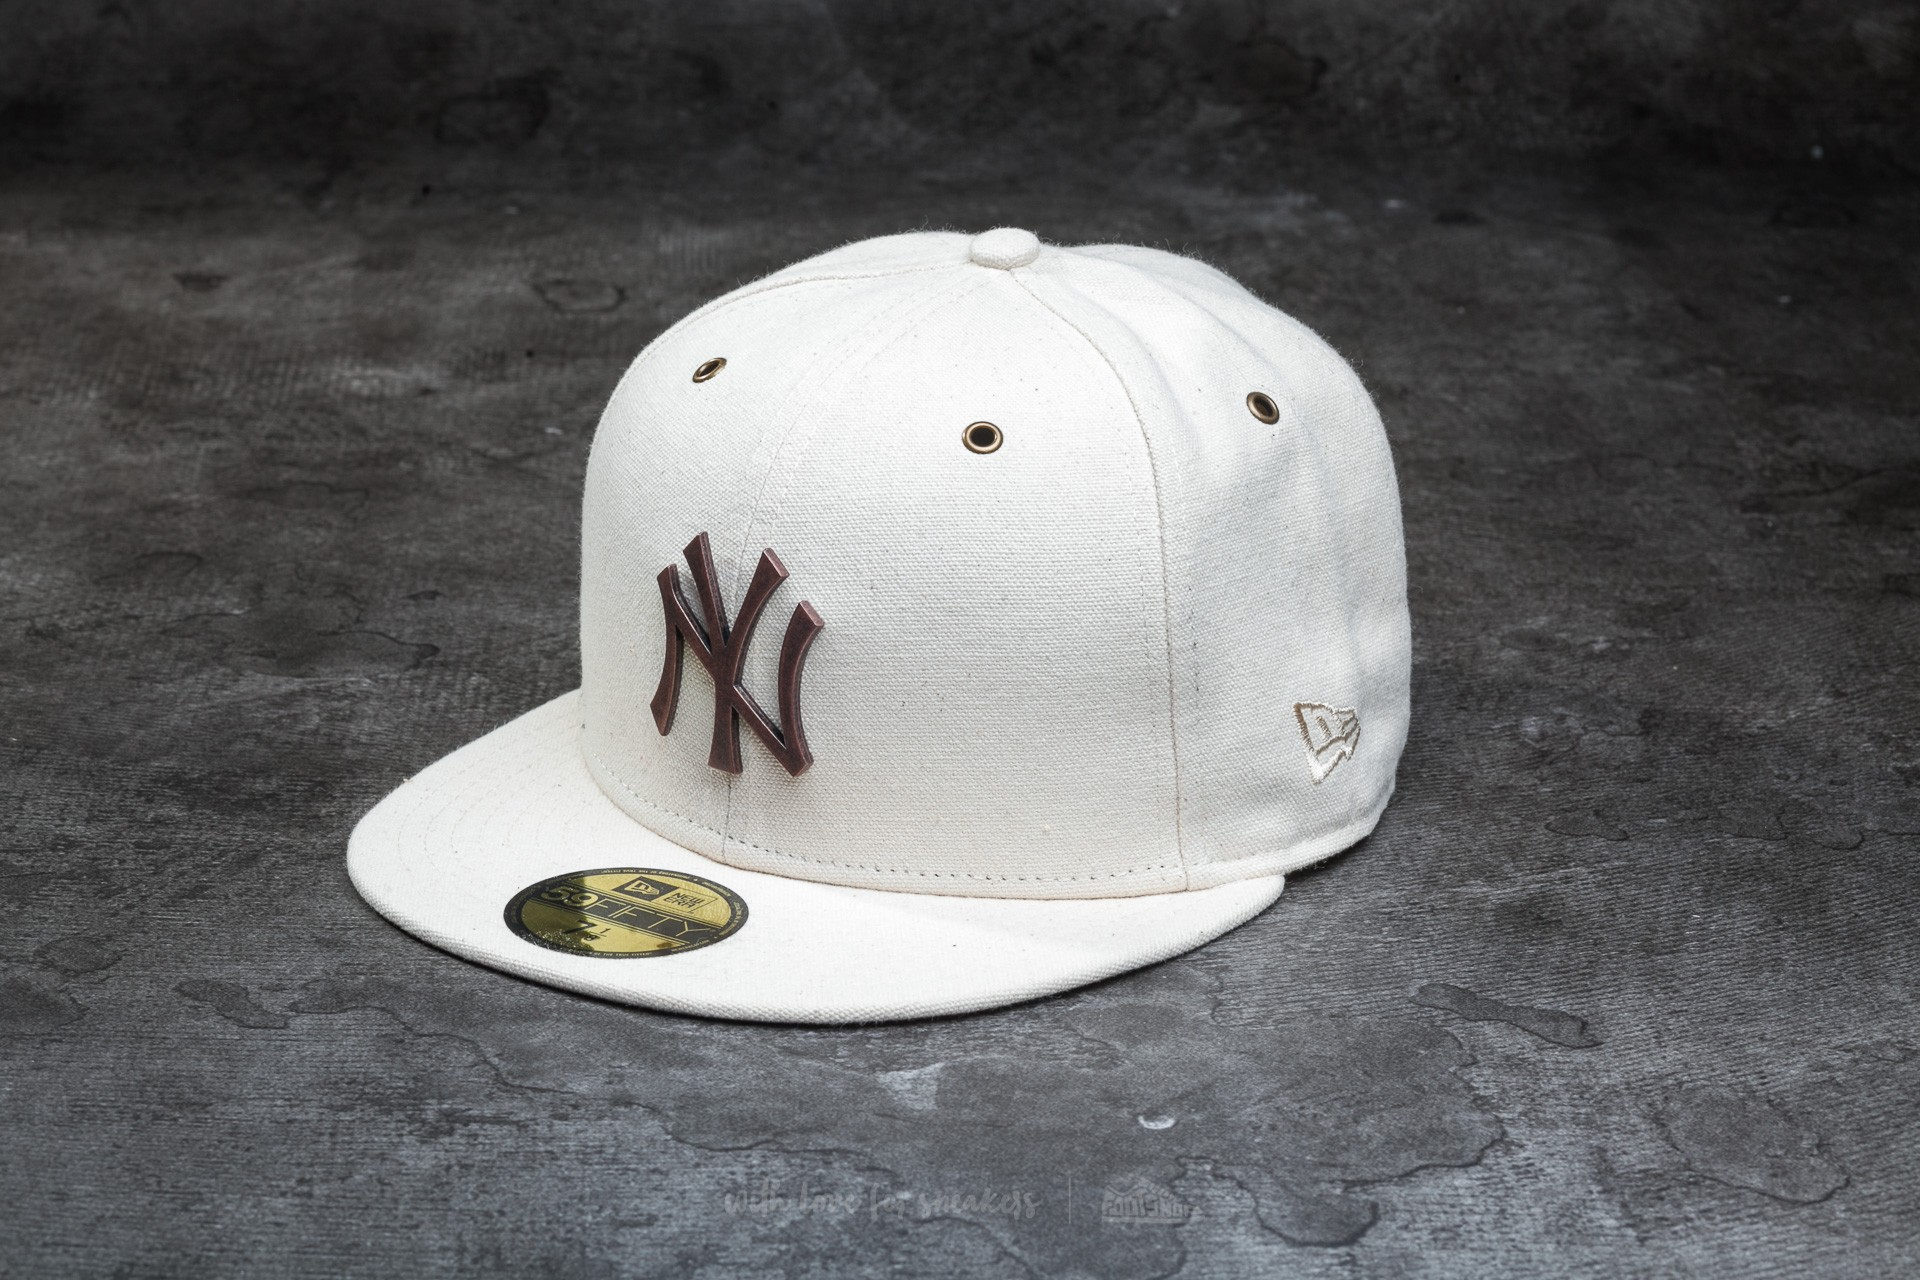 03610fc06ead61 ... inexpensive new era 59fifty crafted major league baseball metal new  york yankees cap 40468 67b1e